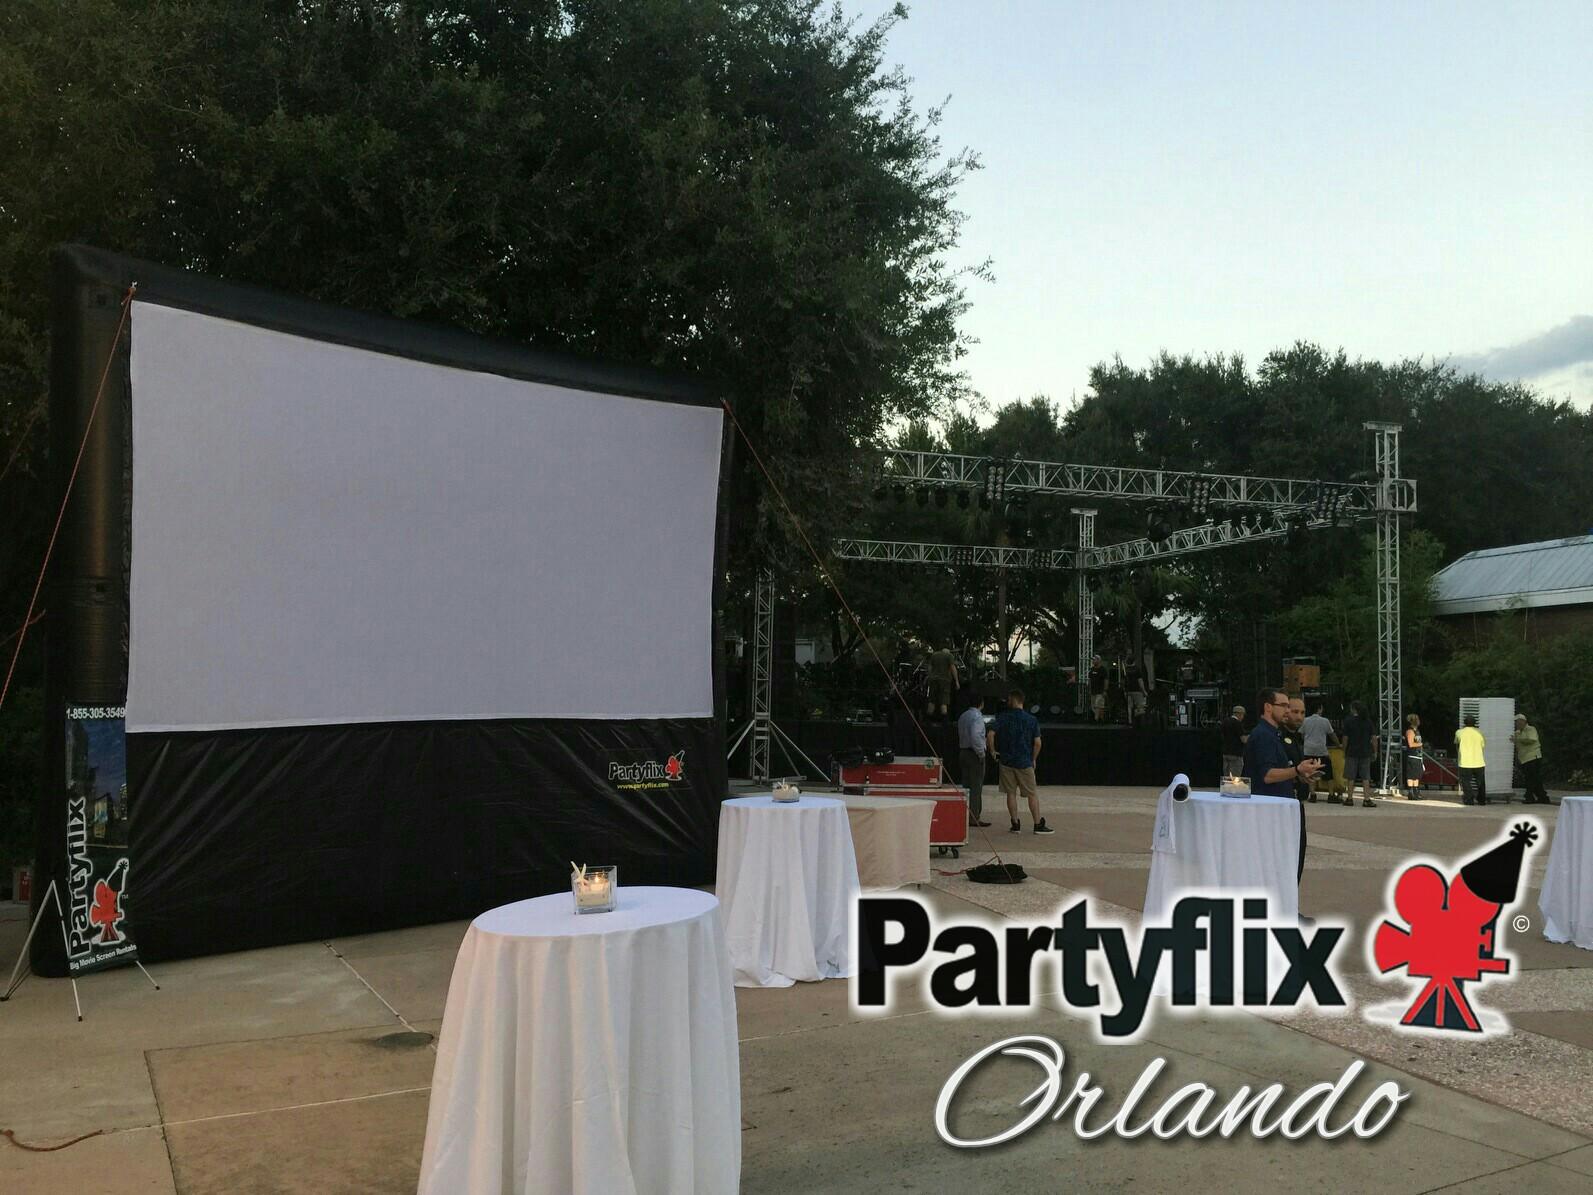 18ft Main EventInflatable Movie Screen (Orlando, FL)